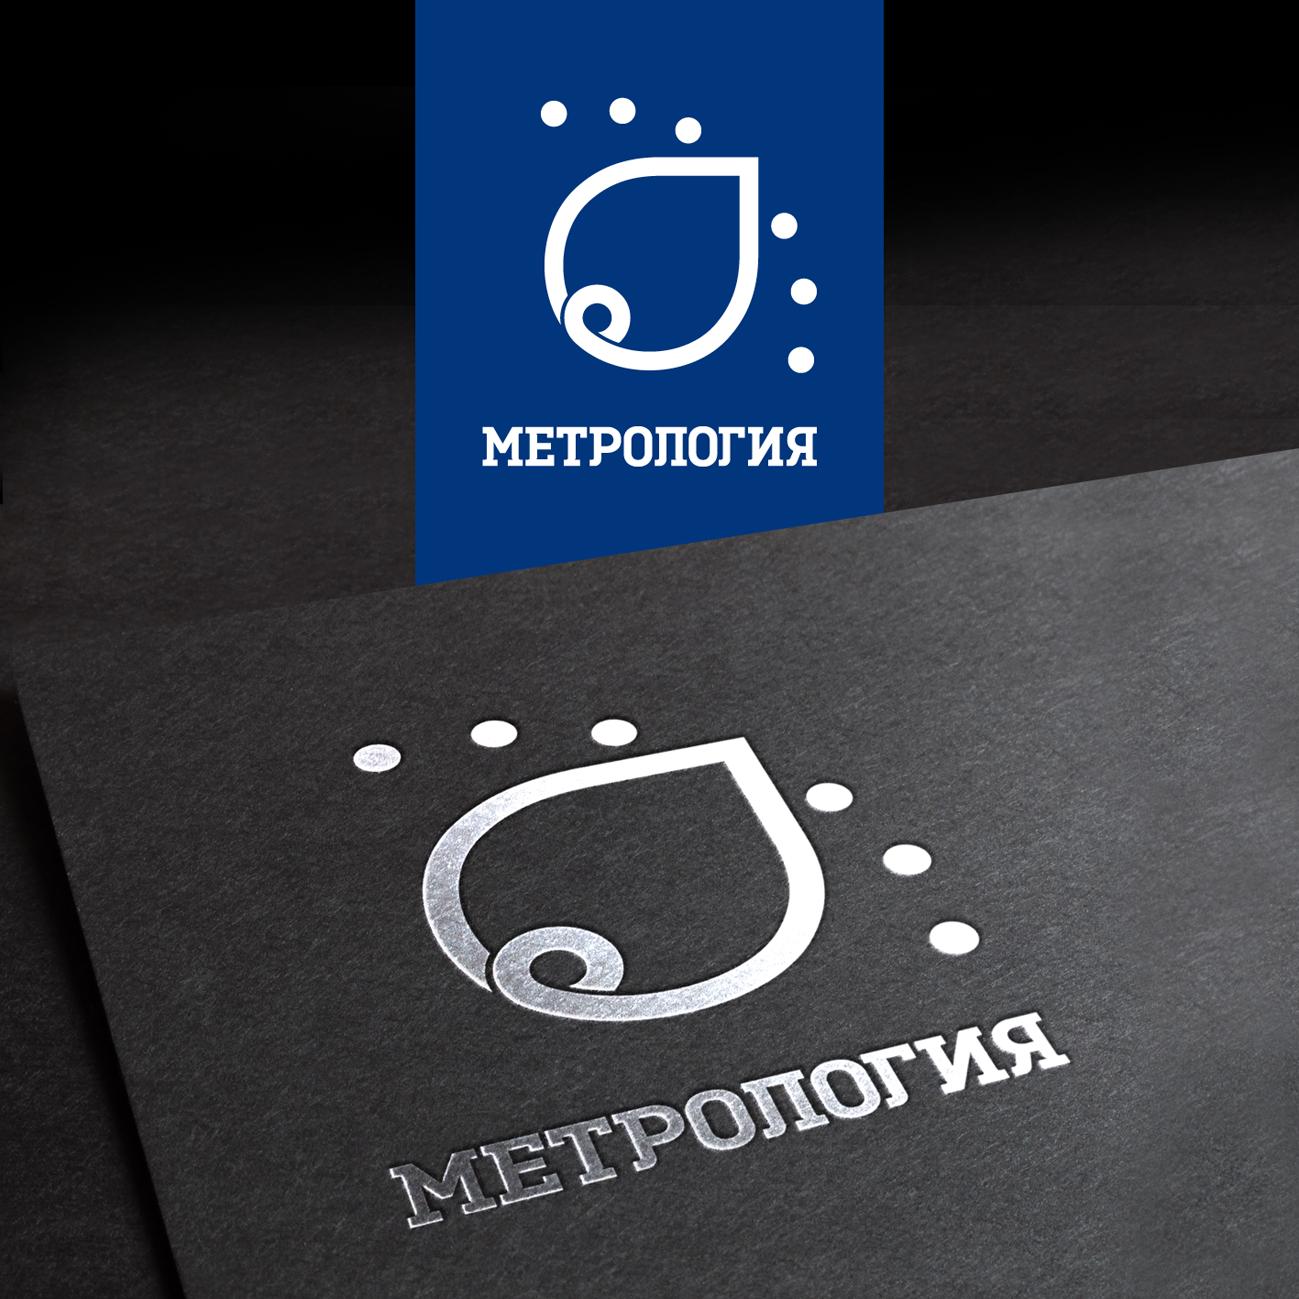 Разработать логотип, визитку, фирменный бланк. фото f_48958fa351be9579.png